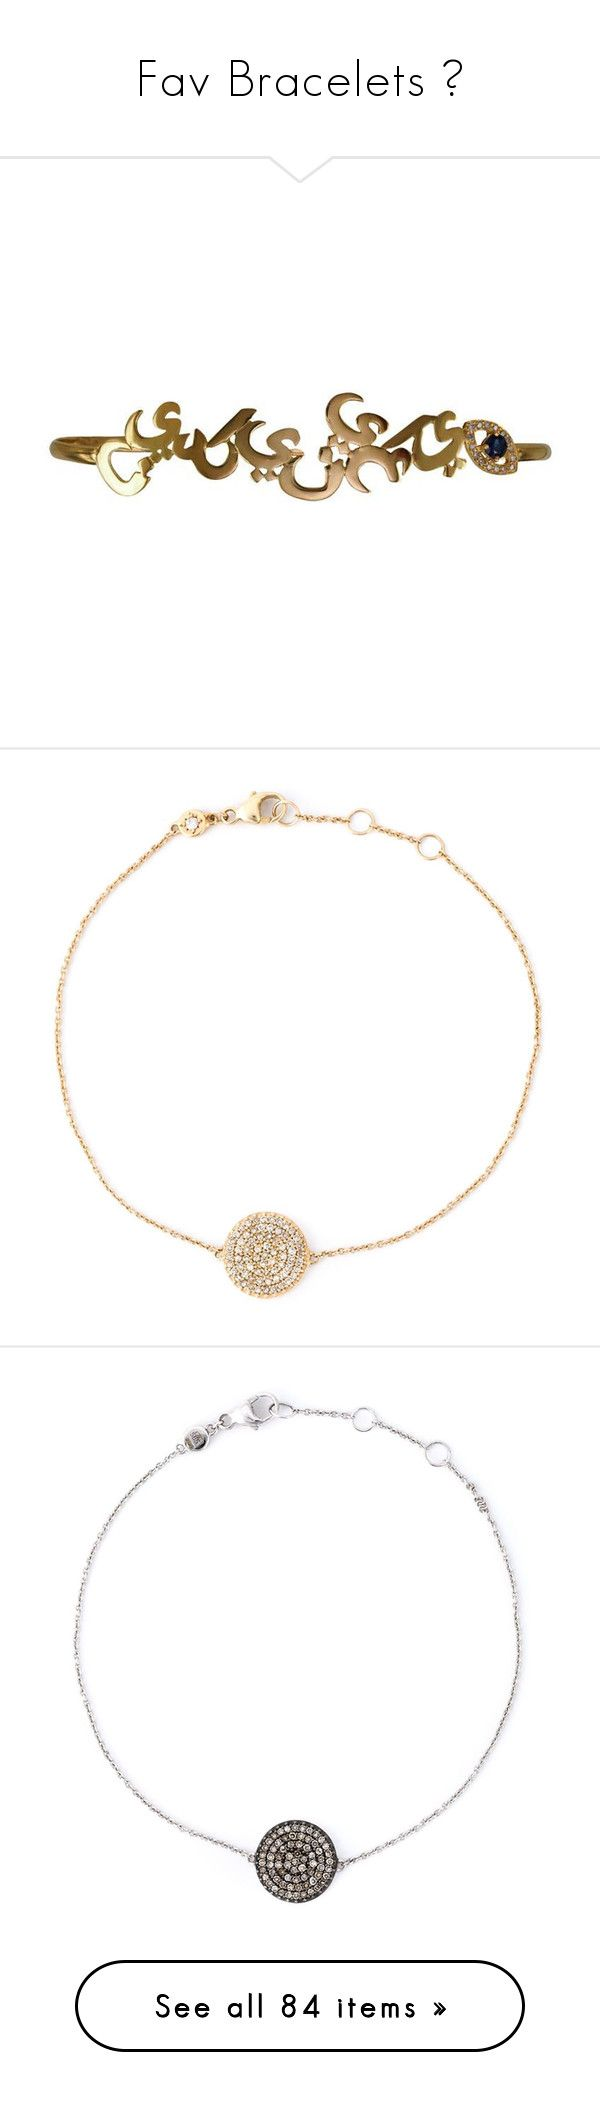 """Fav Bracelets 🍦"" by doggydoddyfroggymoppy ❤ liked on Polyvore featuring jewelry, bracelets, yellow gold bangle, 18k gold jewellery, handcuff jewelry, palm jewelry, gold bangles, metallic, givenchy and white gold bangle"